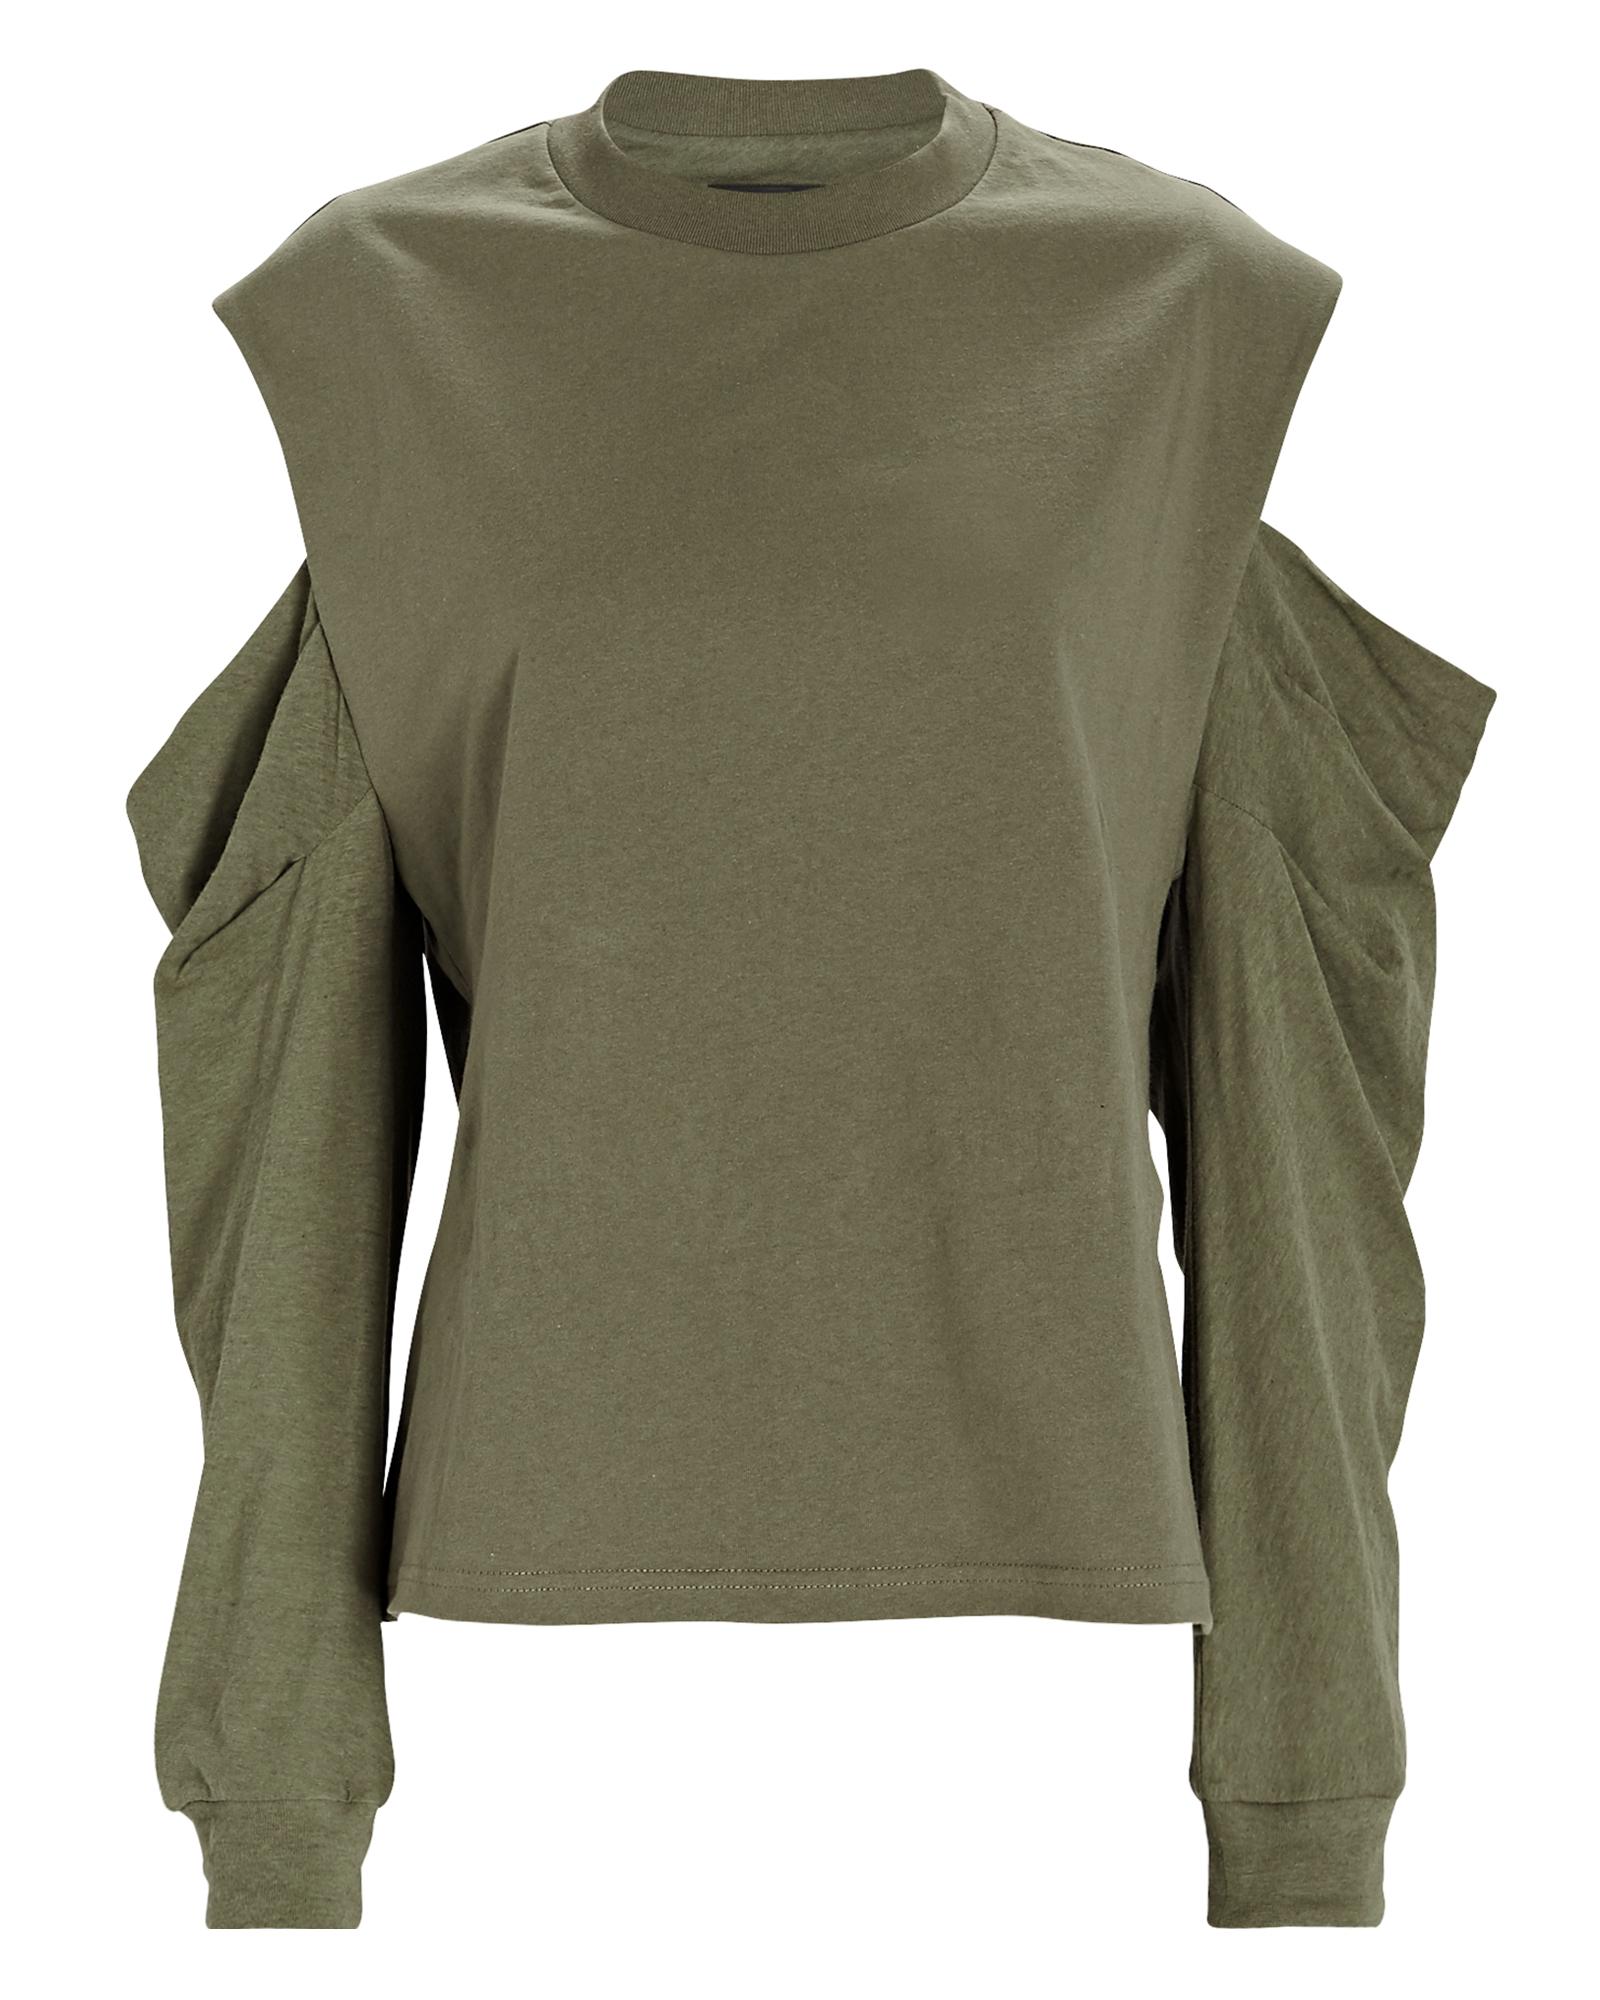 Rta Capucine Cold-Shoulder T-Shirt